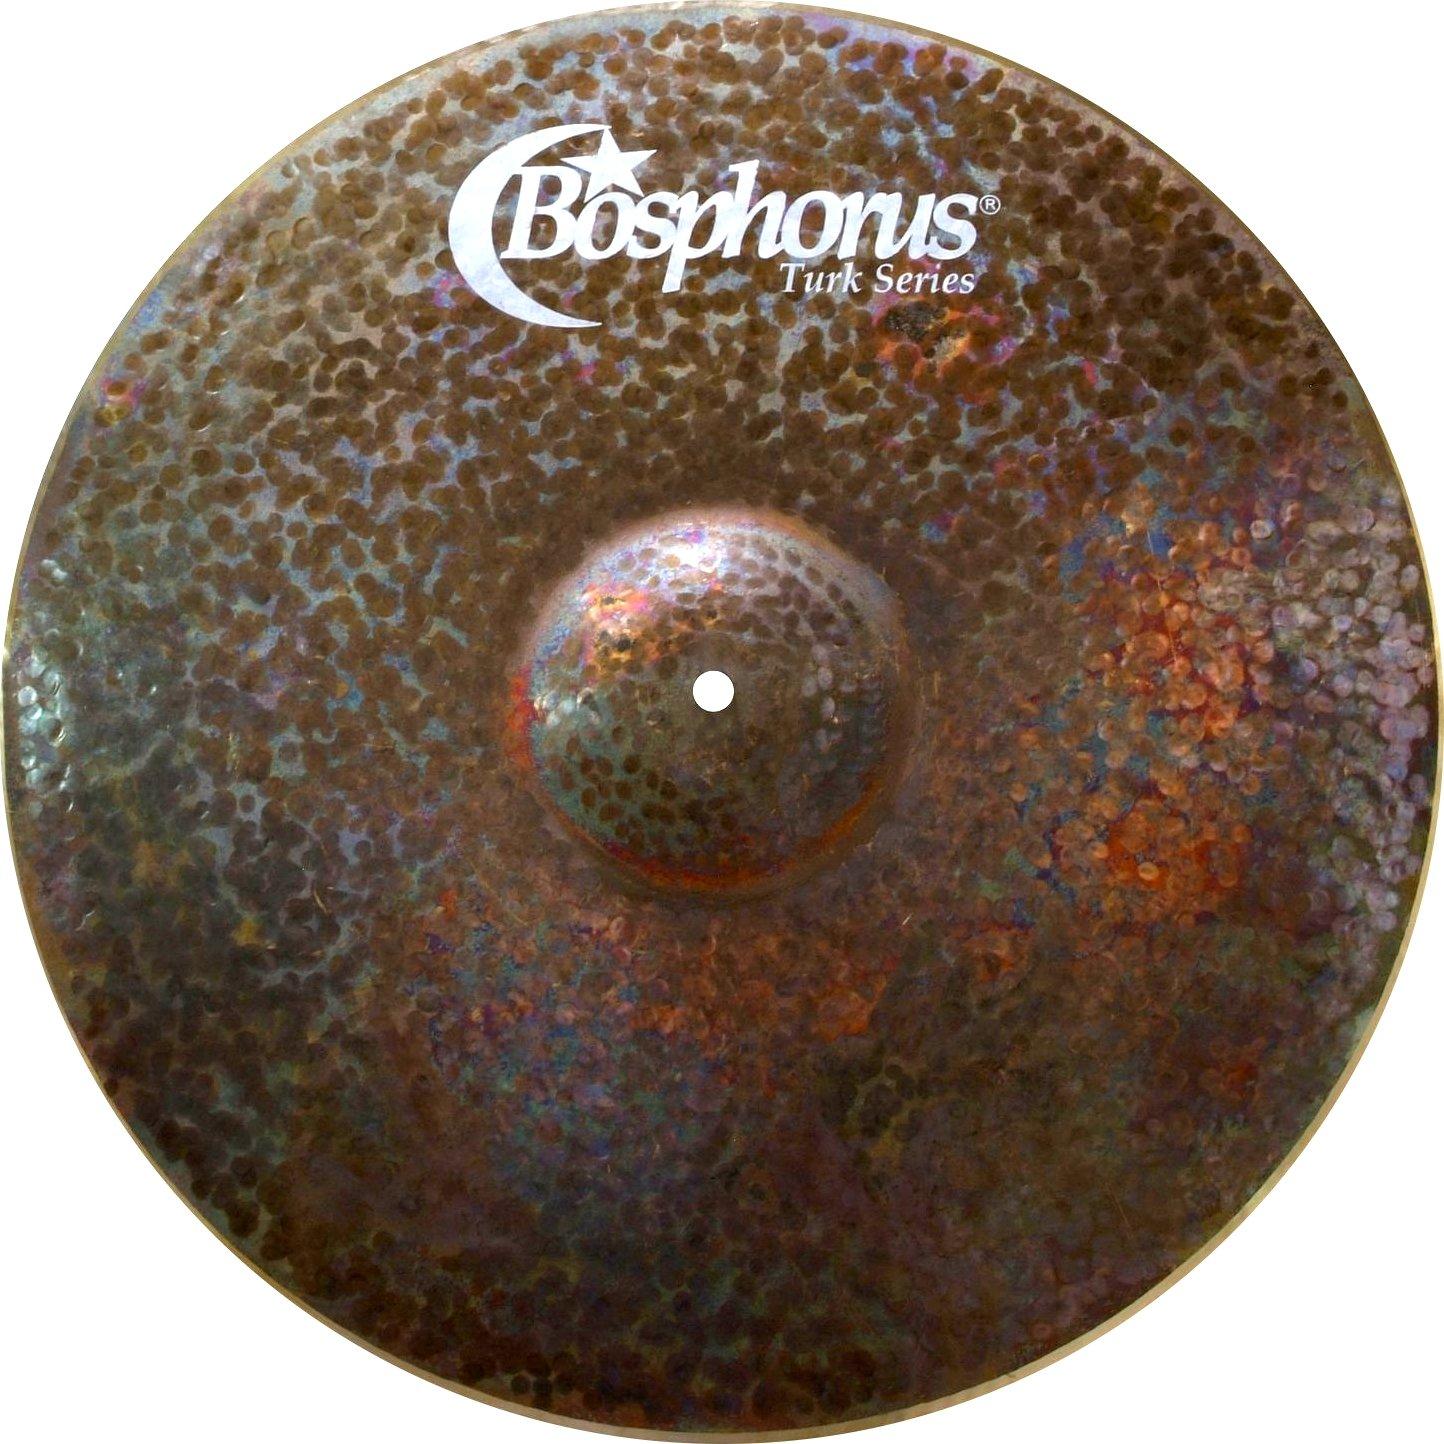 Bosphorus Cymbals K21RM 21-Inch Turk Series Ride Cymbal by Bosphorus Cymbals   B00JBH6HGY